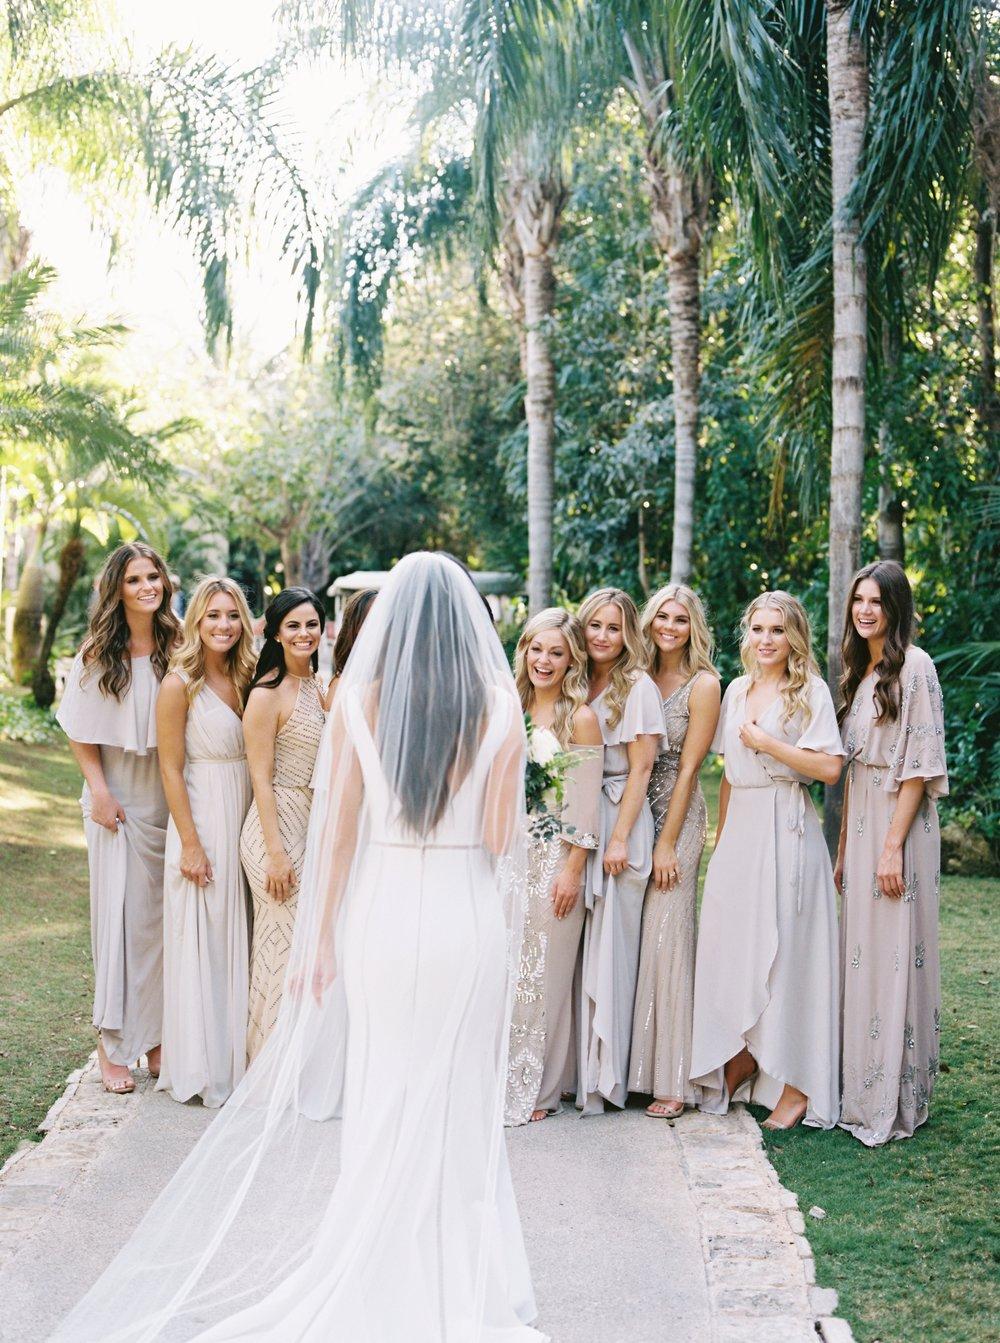 Kyle John l Fine Art Wedding Photography l Chicago, Copenhagen, California, New York, Destination l Blog l Brooke Boyd_The Film Poets_Tulum Wedding_9